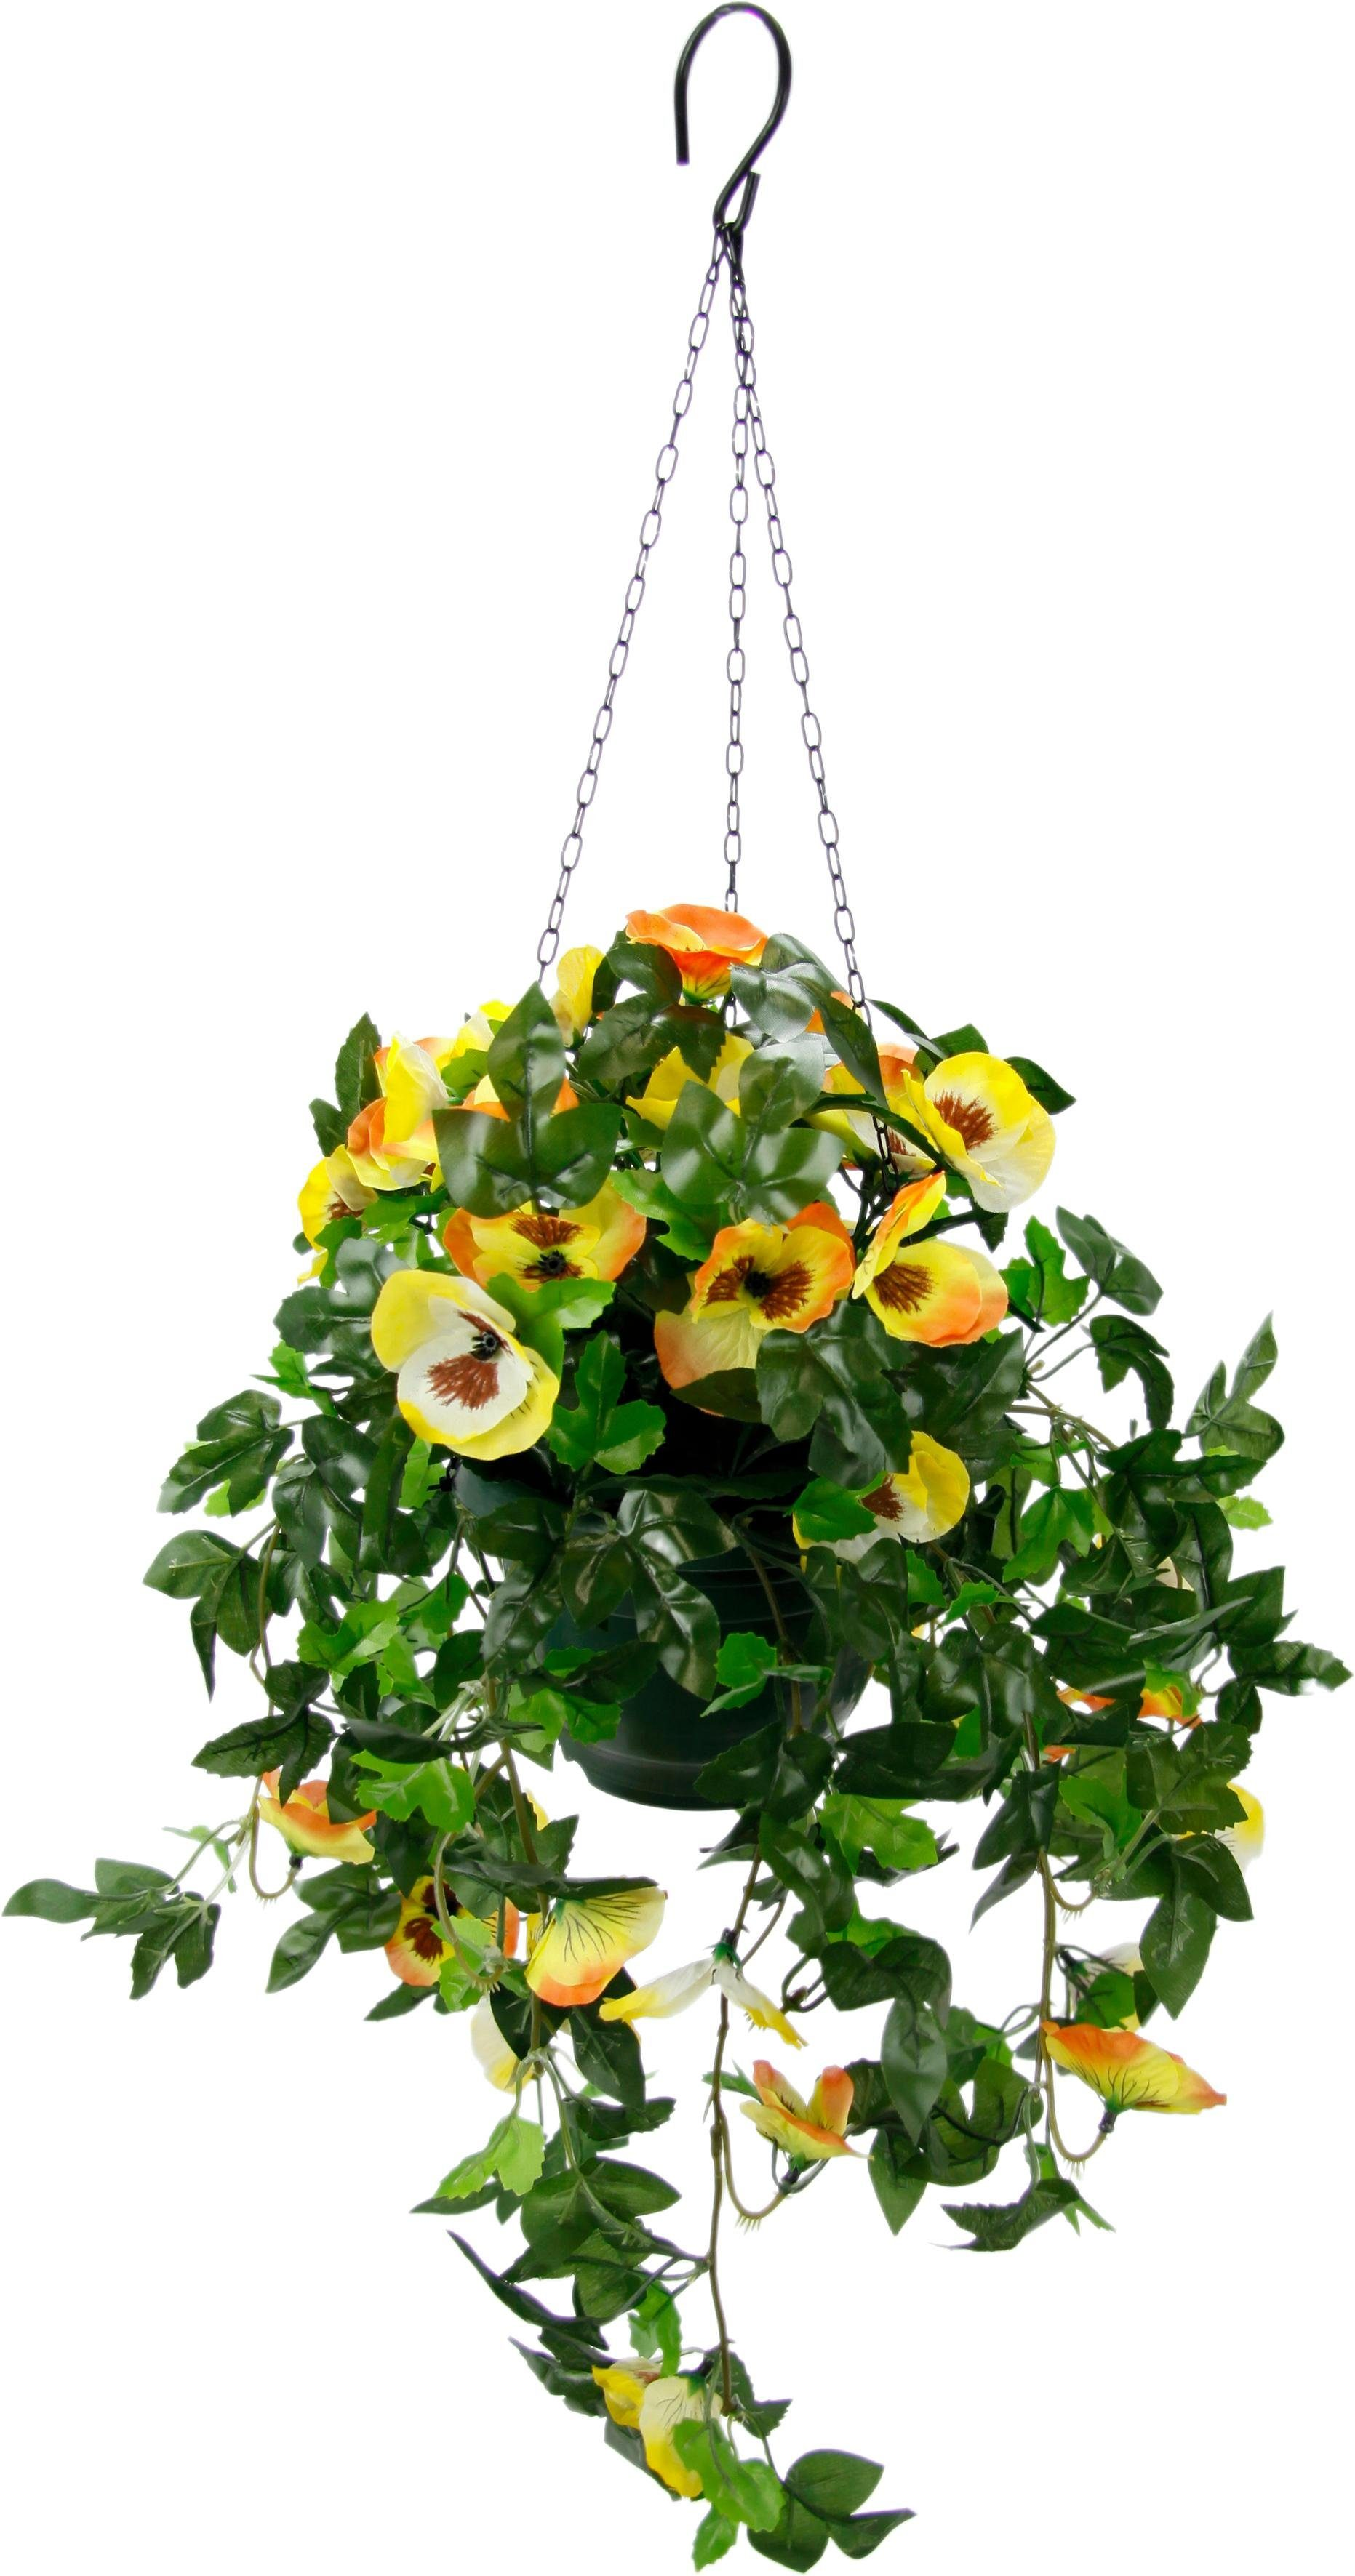 Kunstblume »Stiefmütterchenhängeampel«